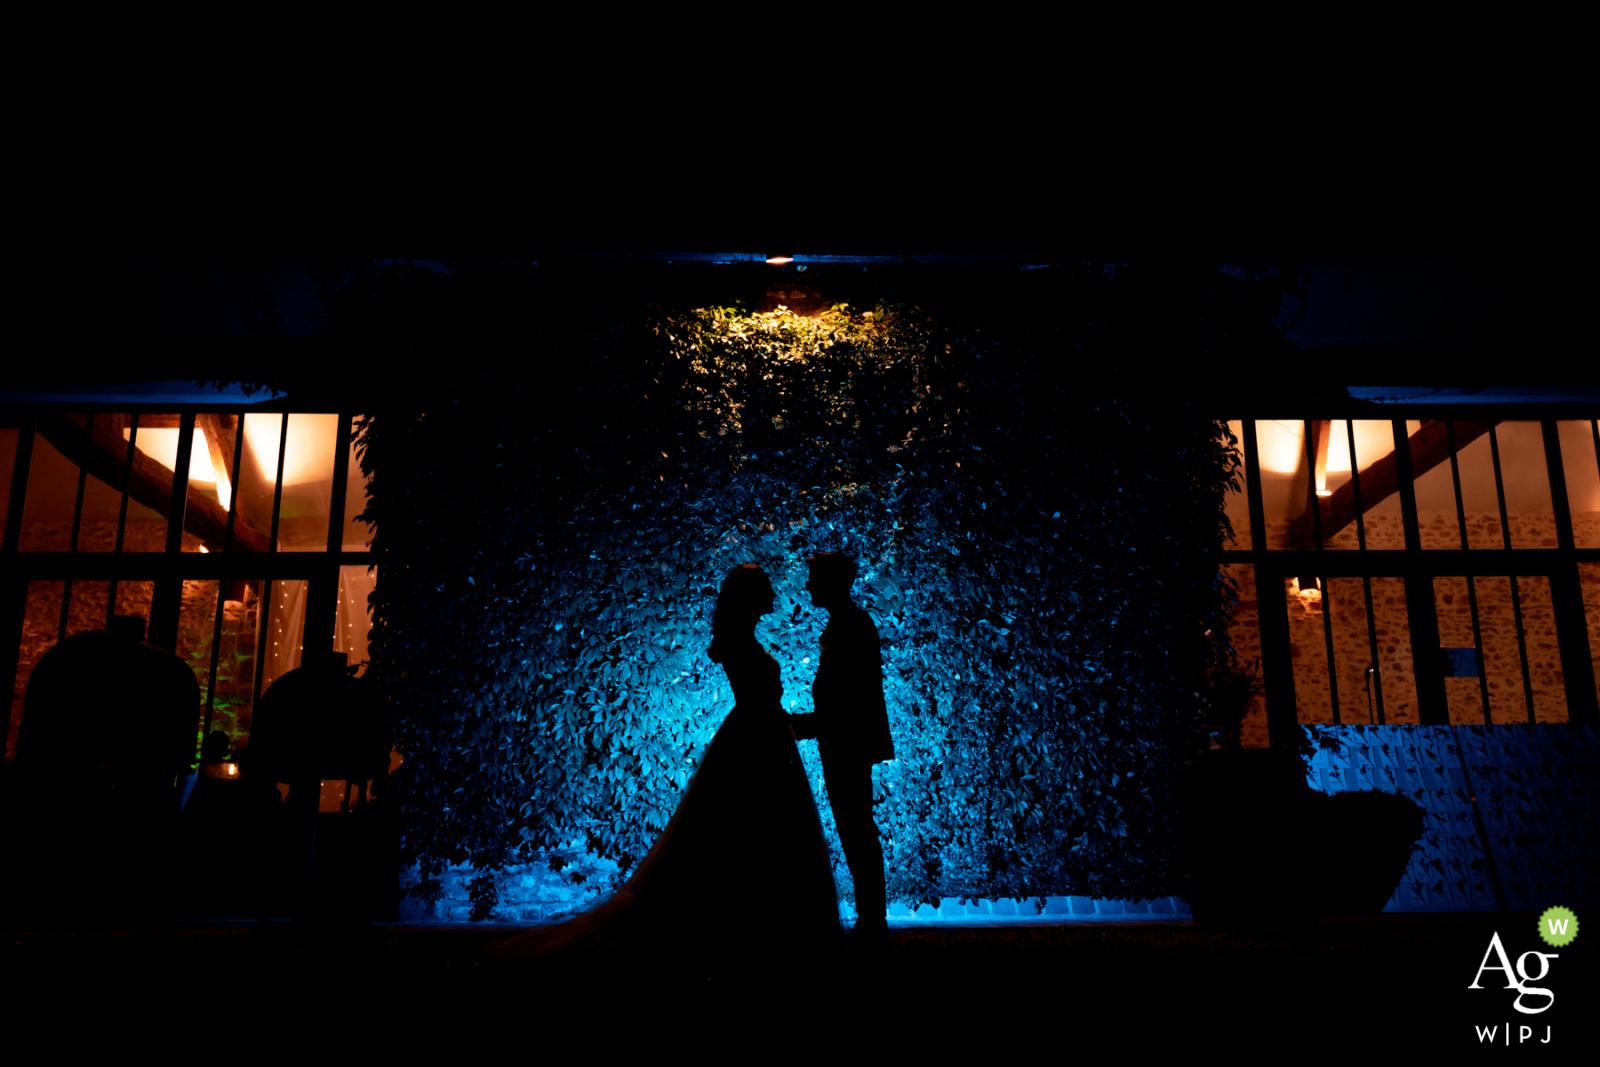 Les Hauts de Pardaillan, France couple posing for a wedding Night shot during dinner